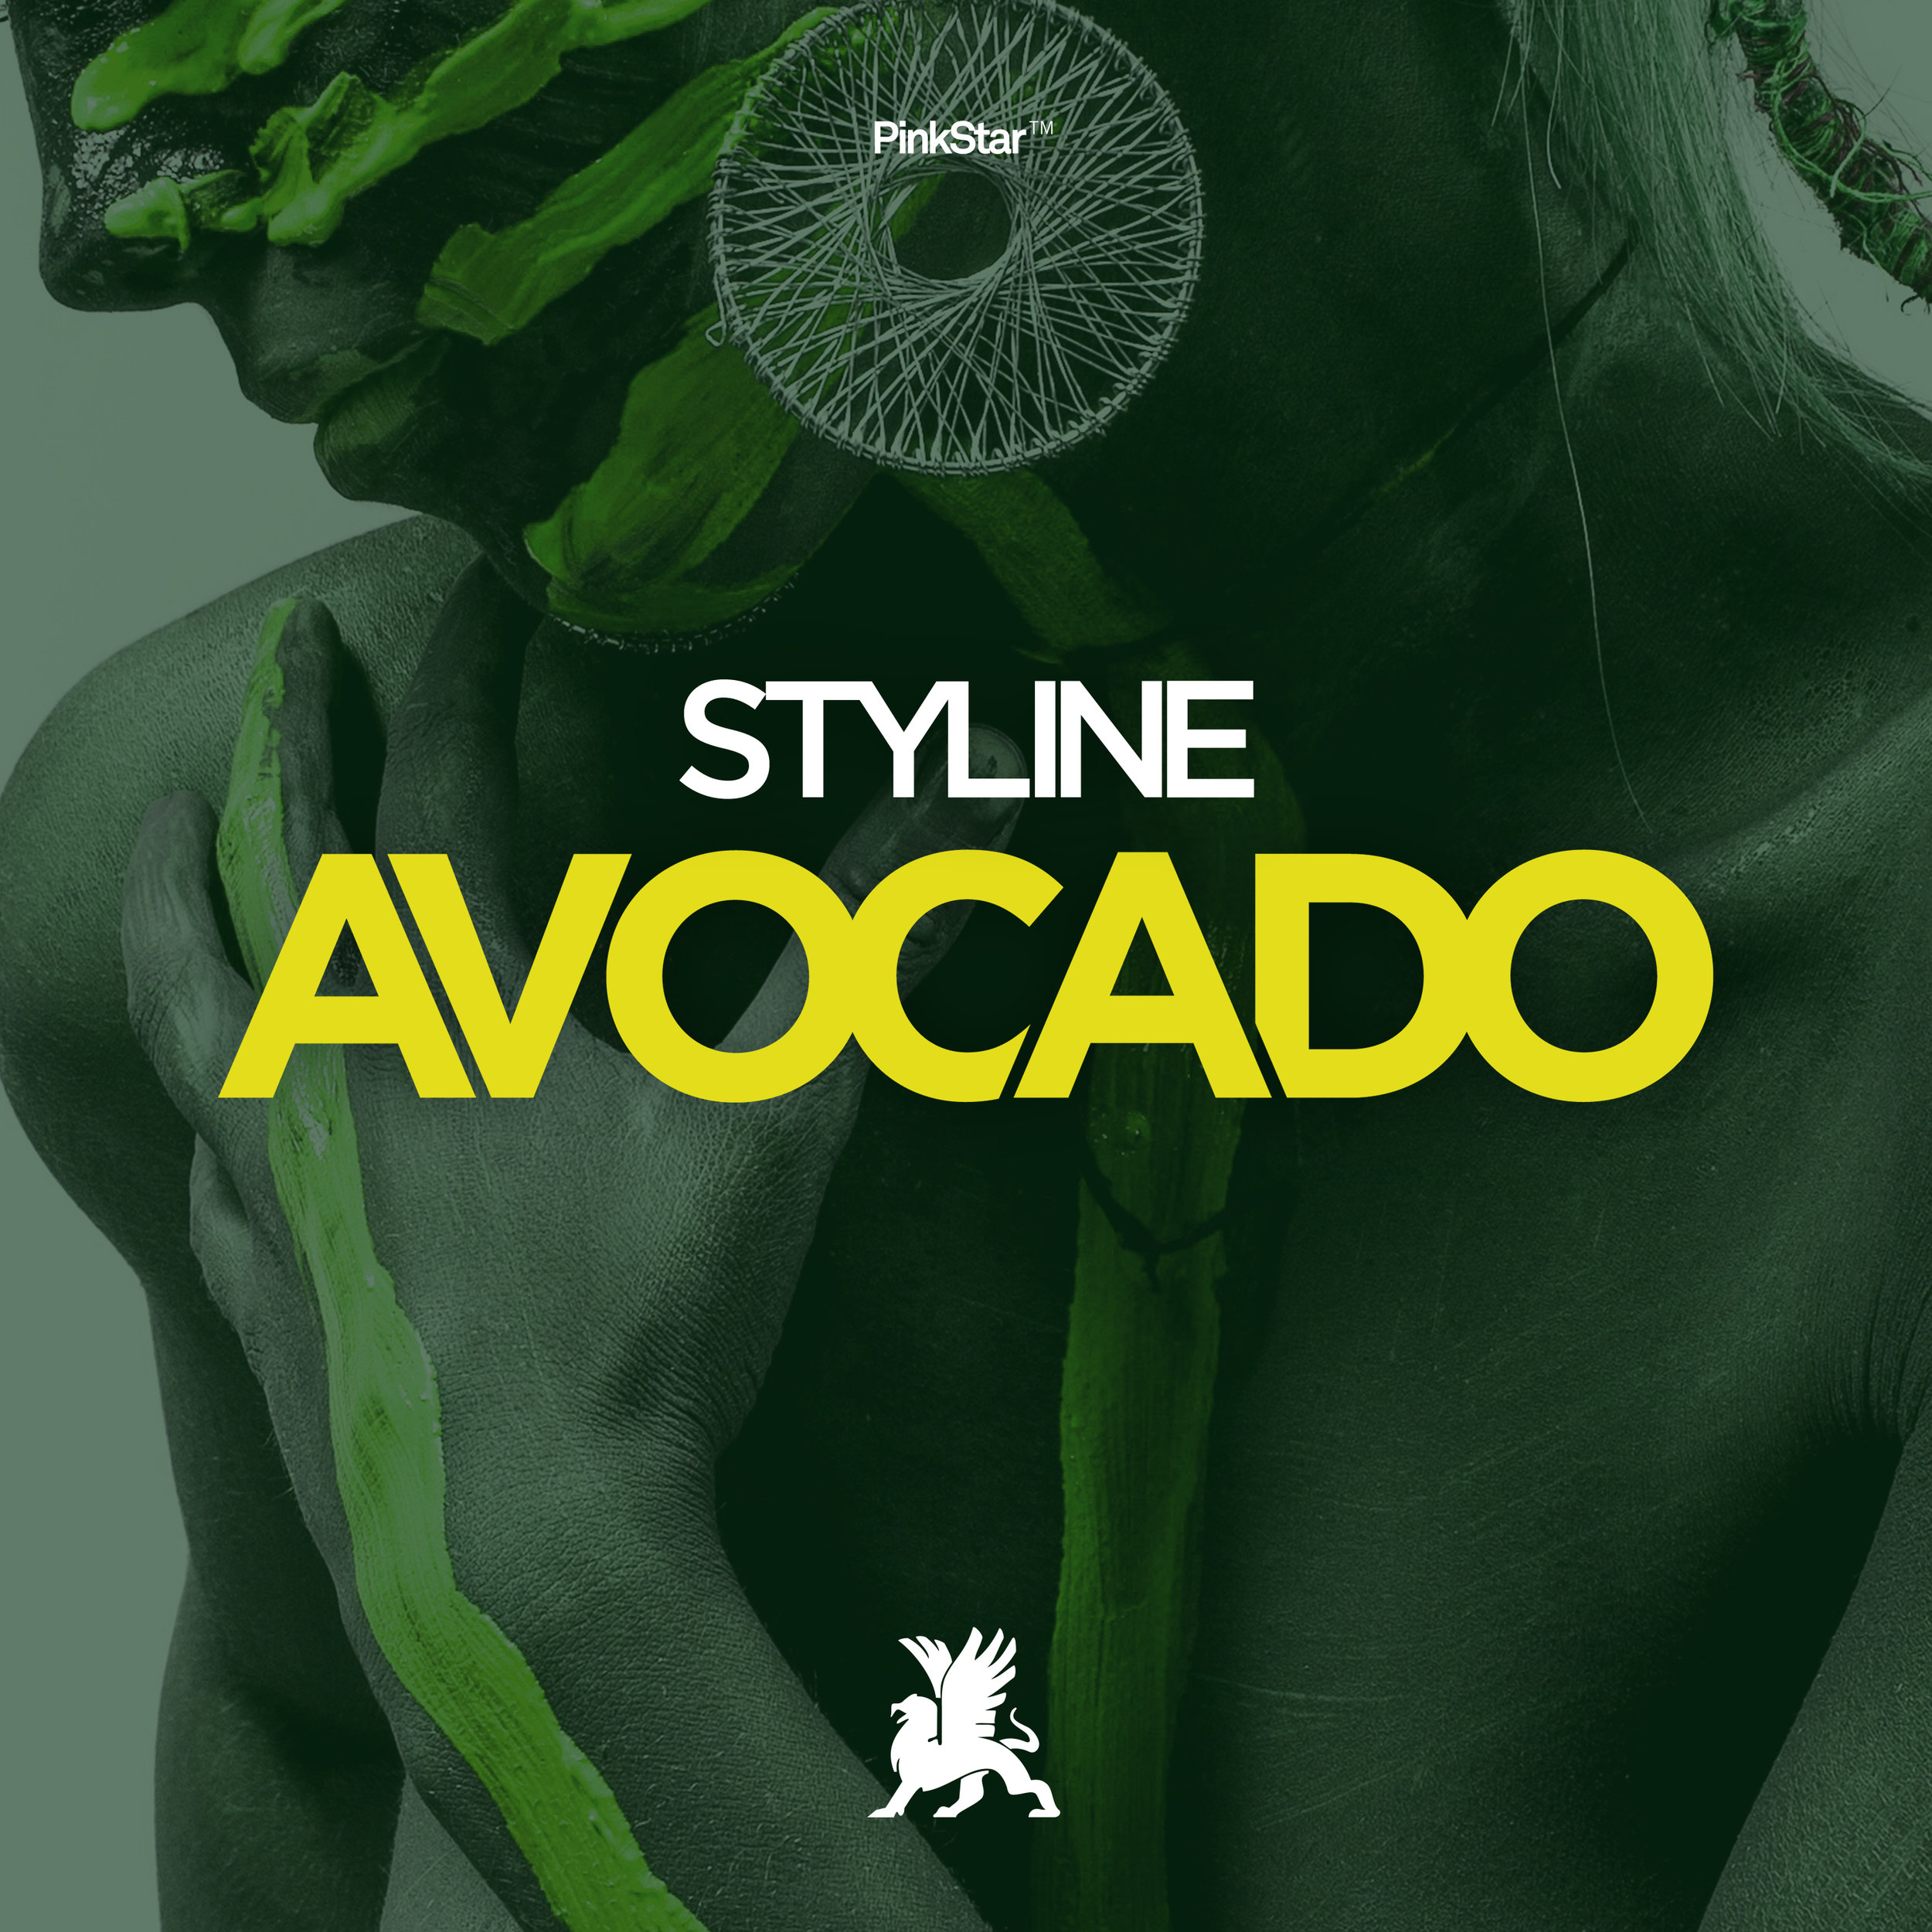 Styline - Avocado